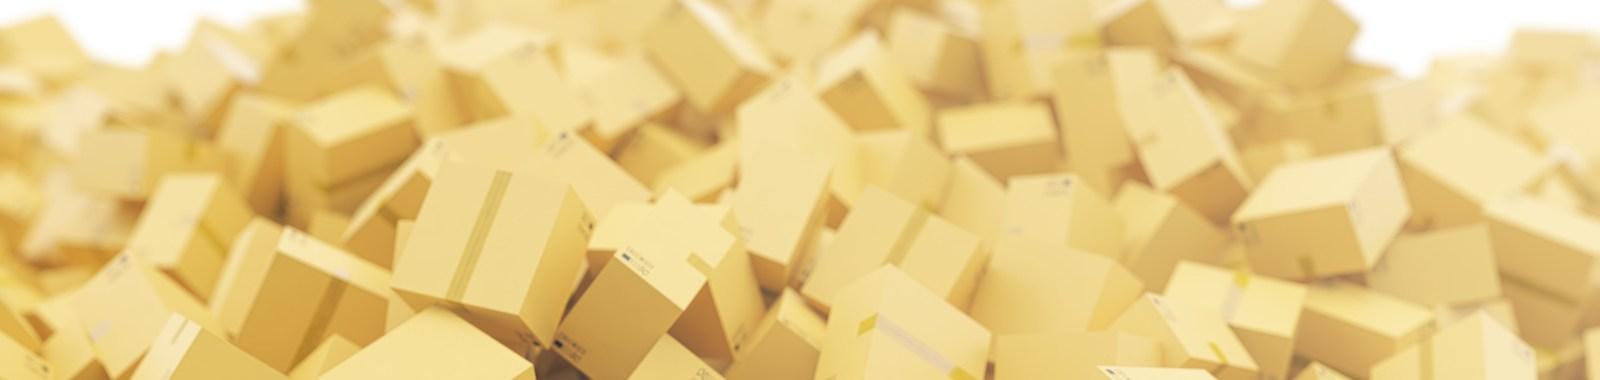 Stack of cardboard delivery boxes or parcels background, 3d rendering